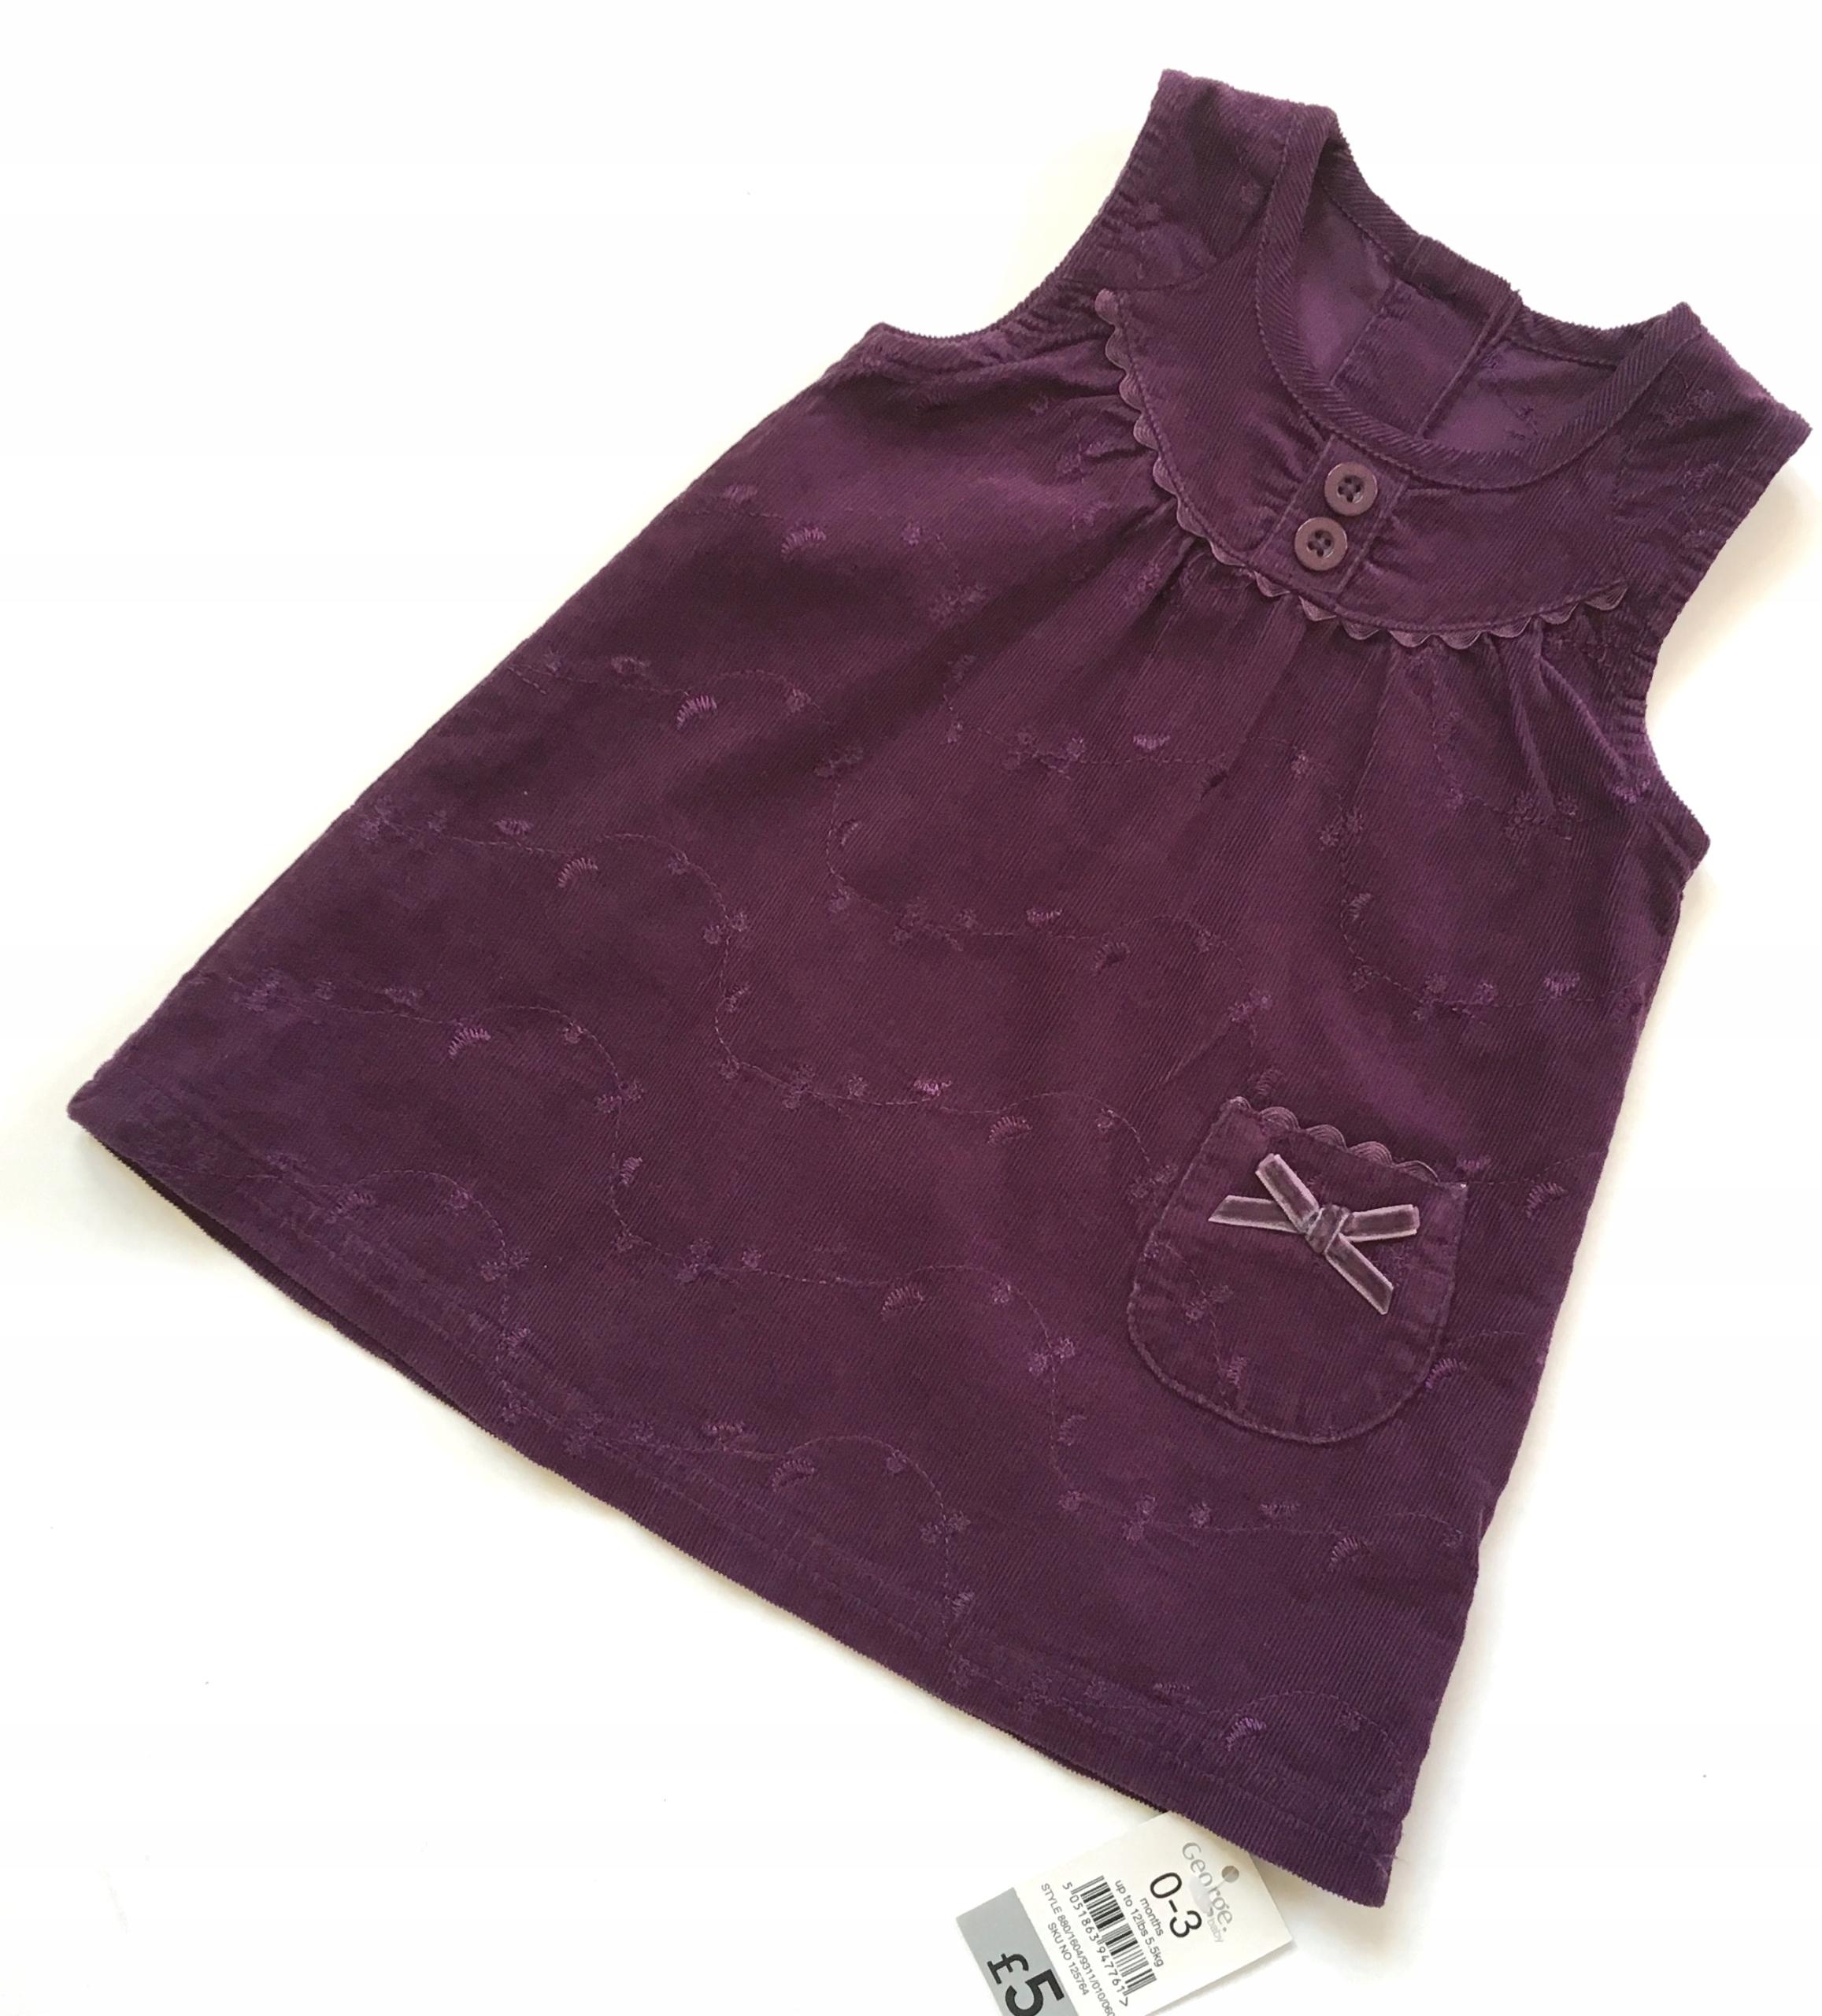 GEORGE sukienka sztruks fiolet 56/62 0-3m